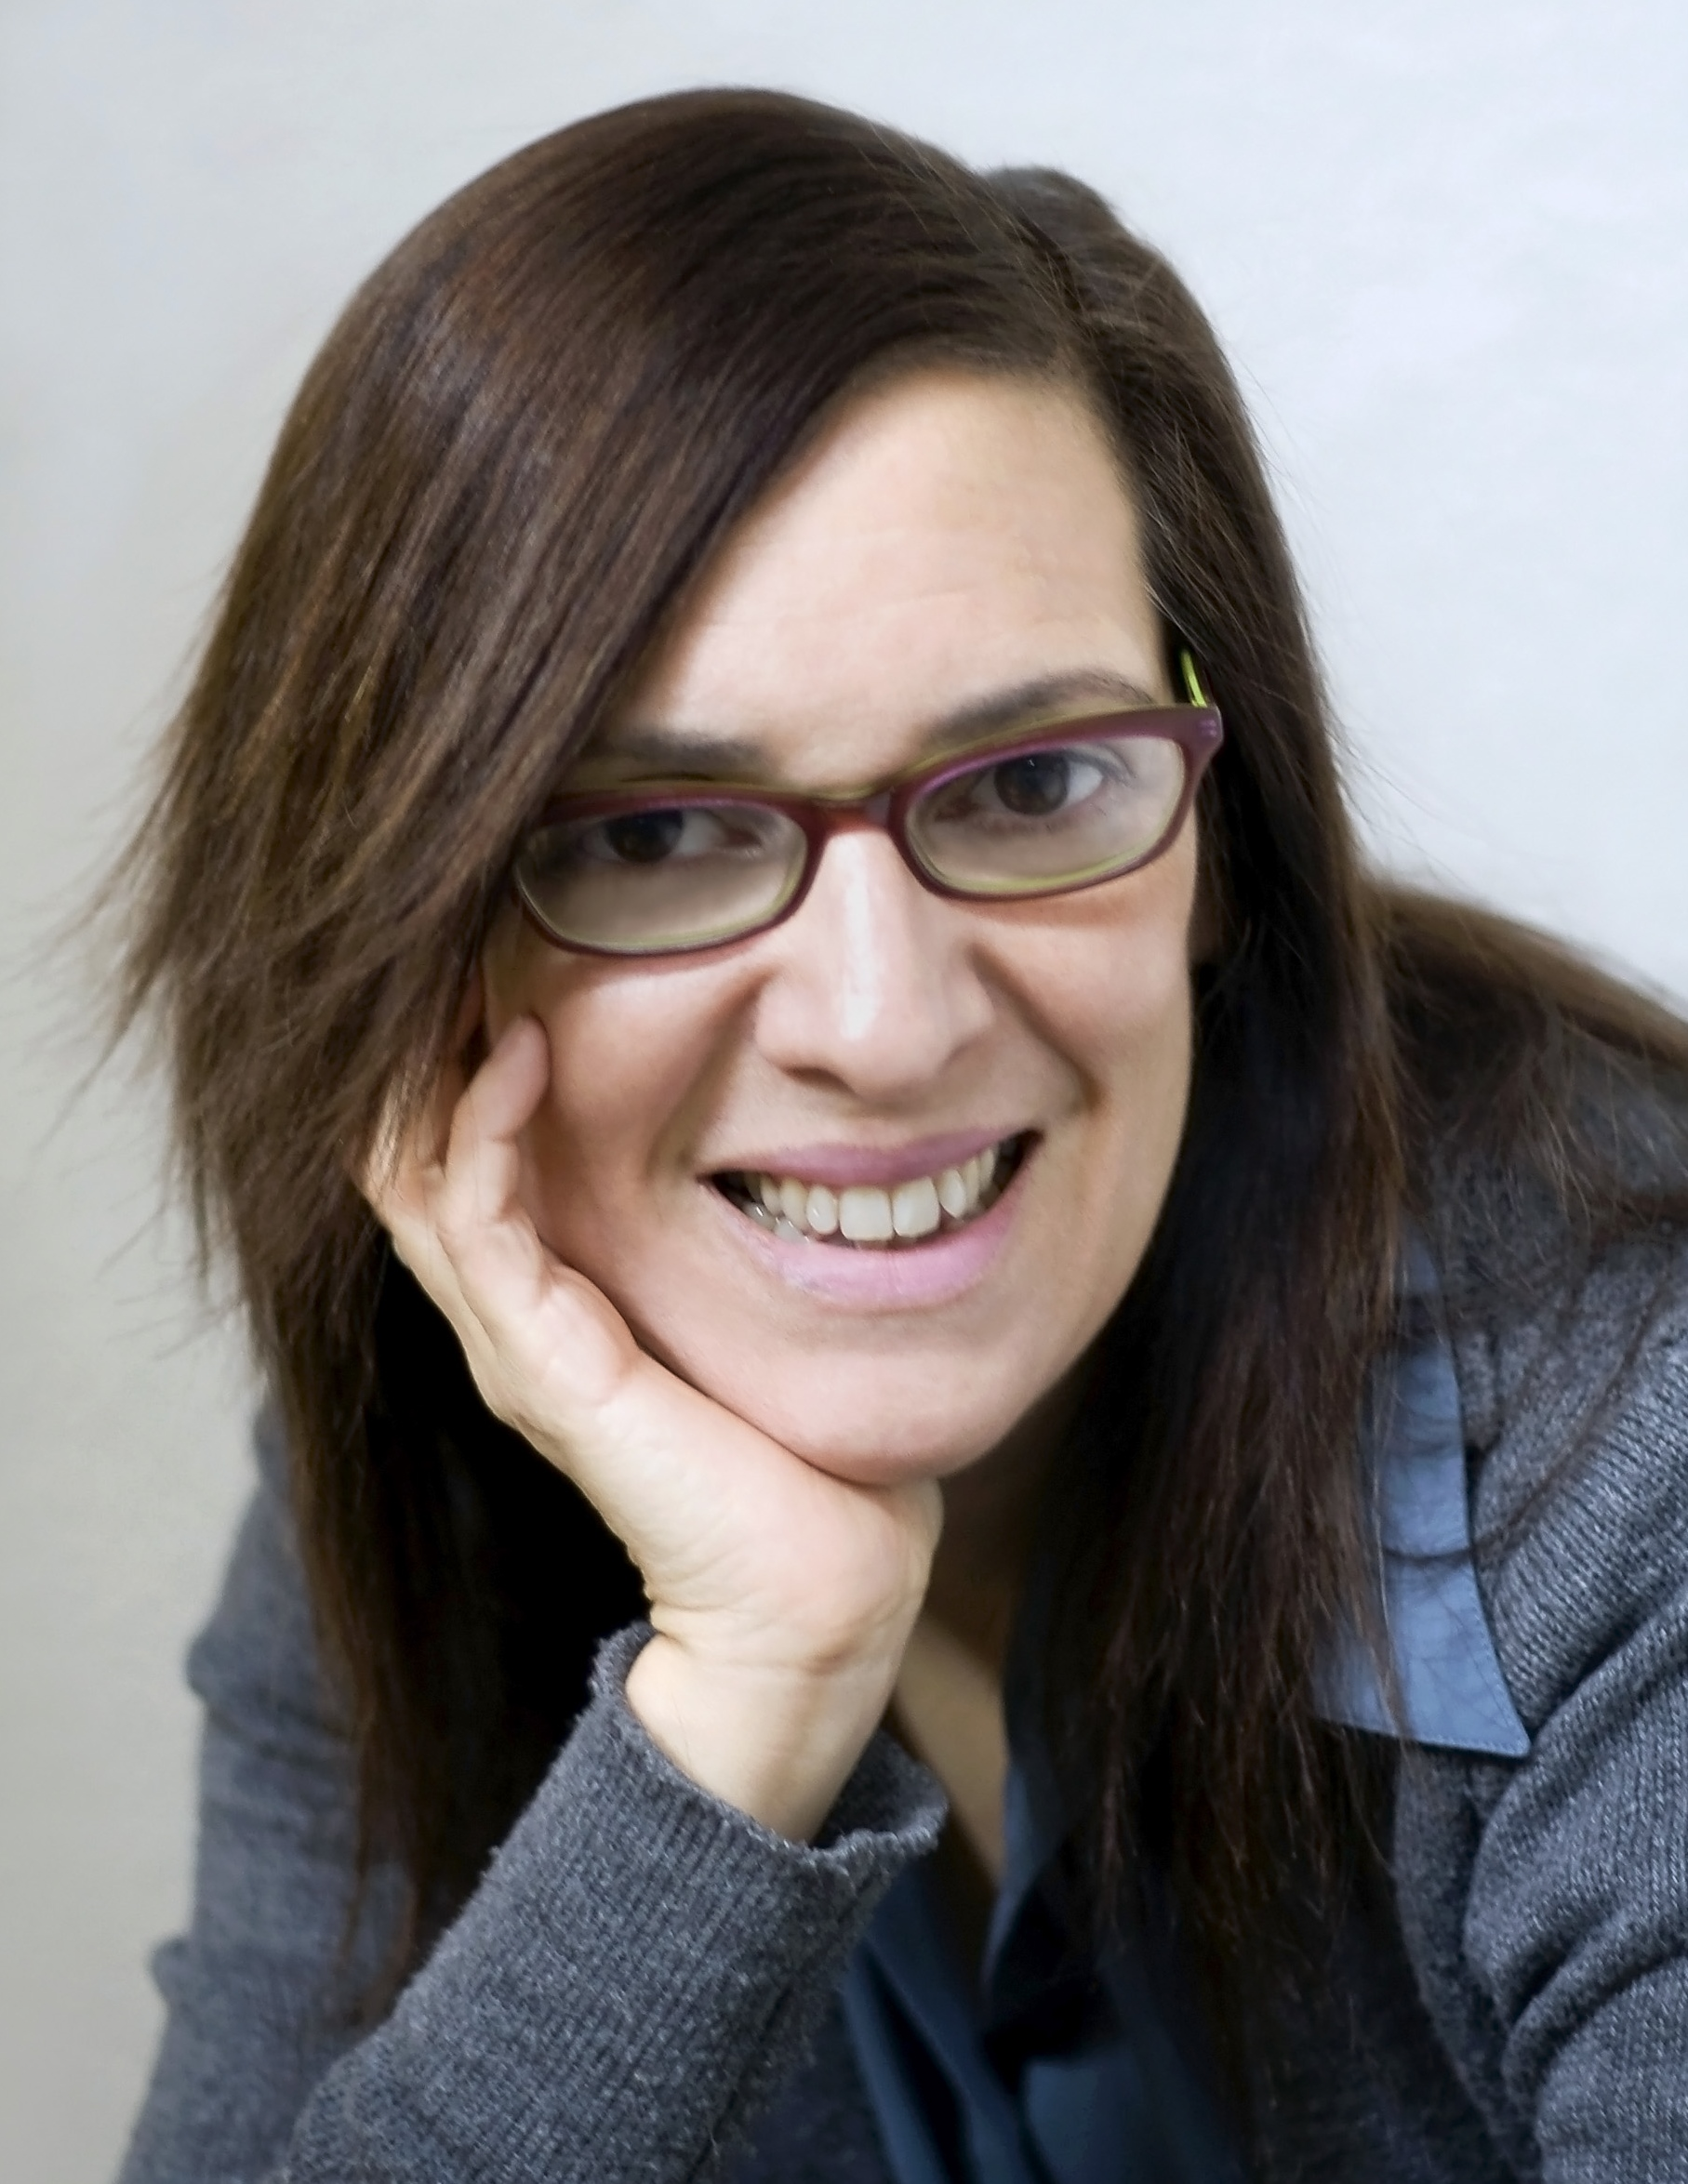 Liz Ortiz-Mackes, I Ain't Playin' Films